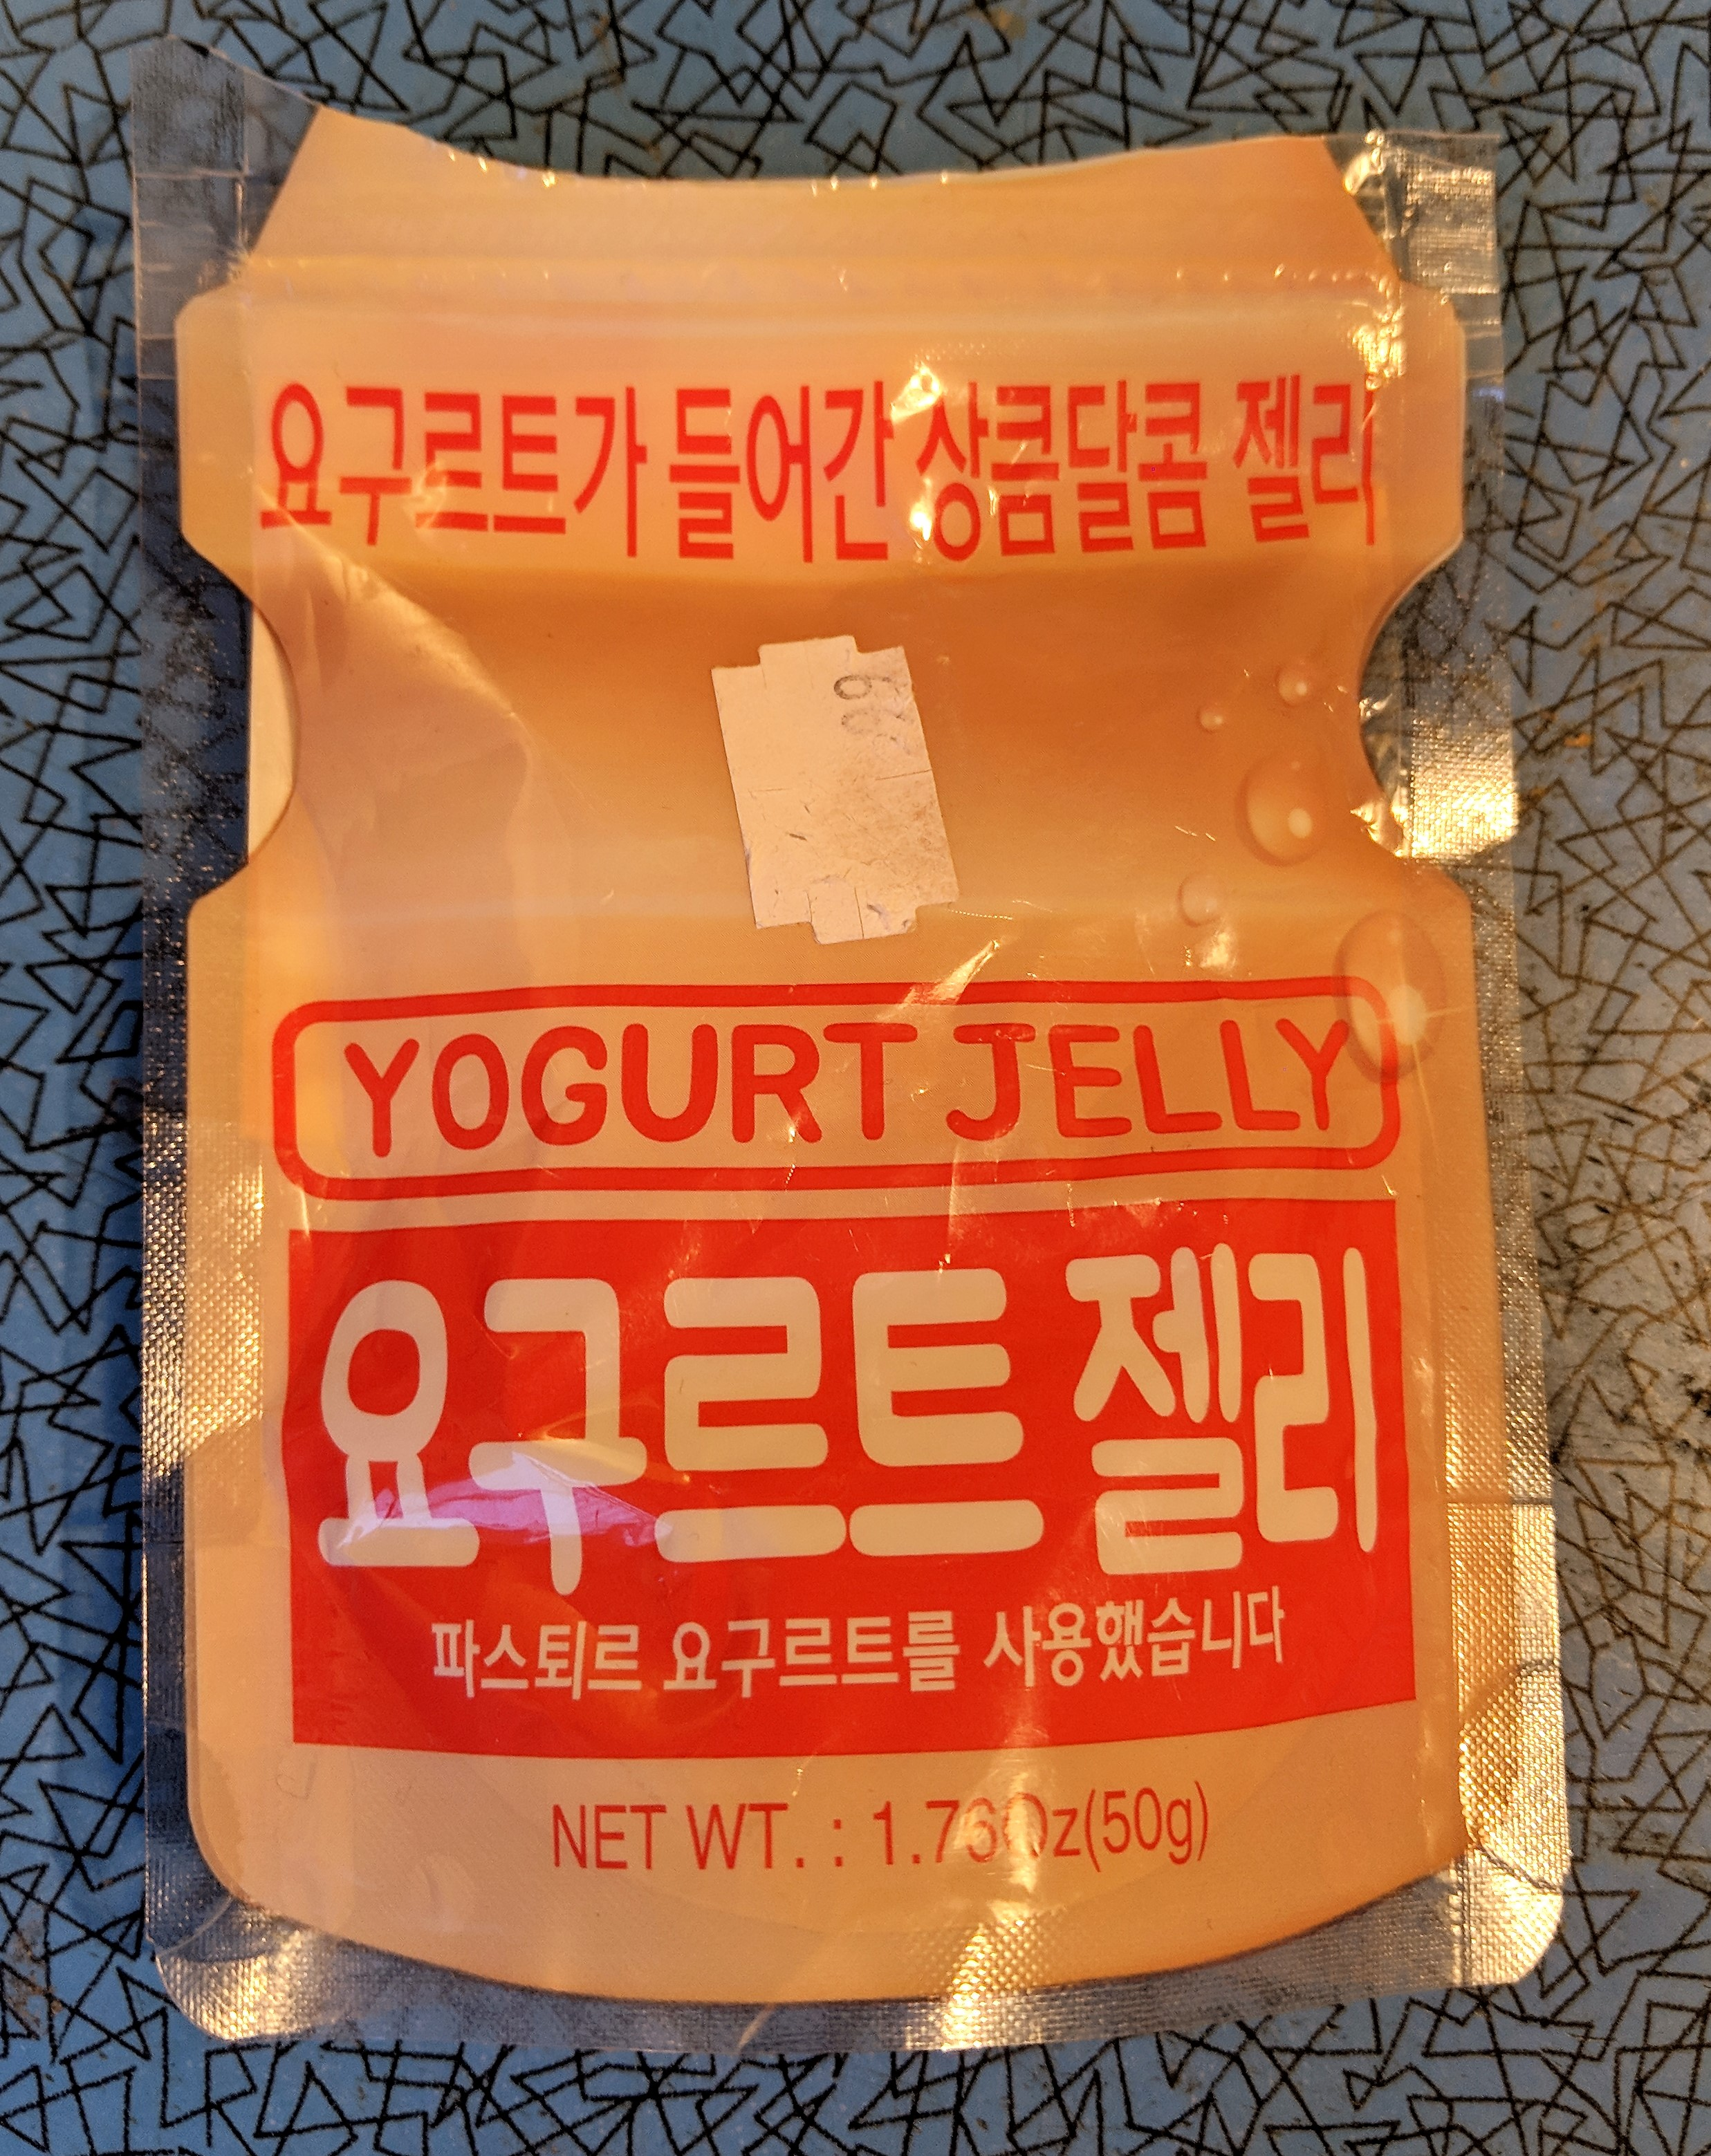 Yogurt Jelly 01